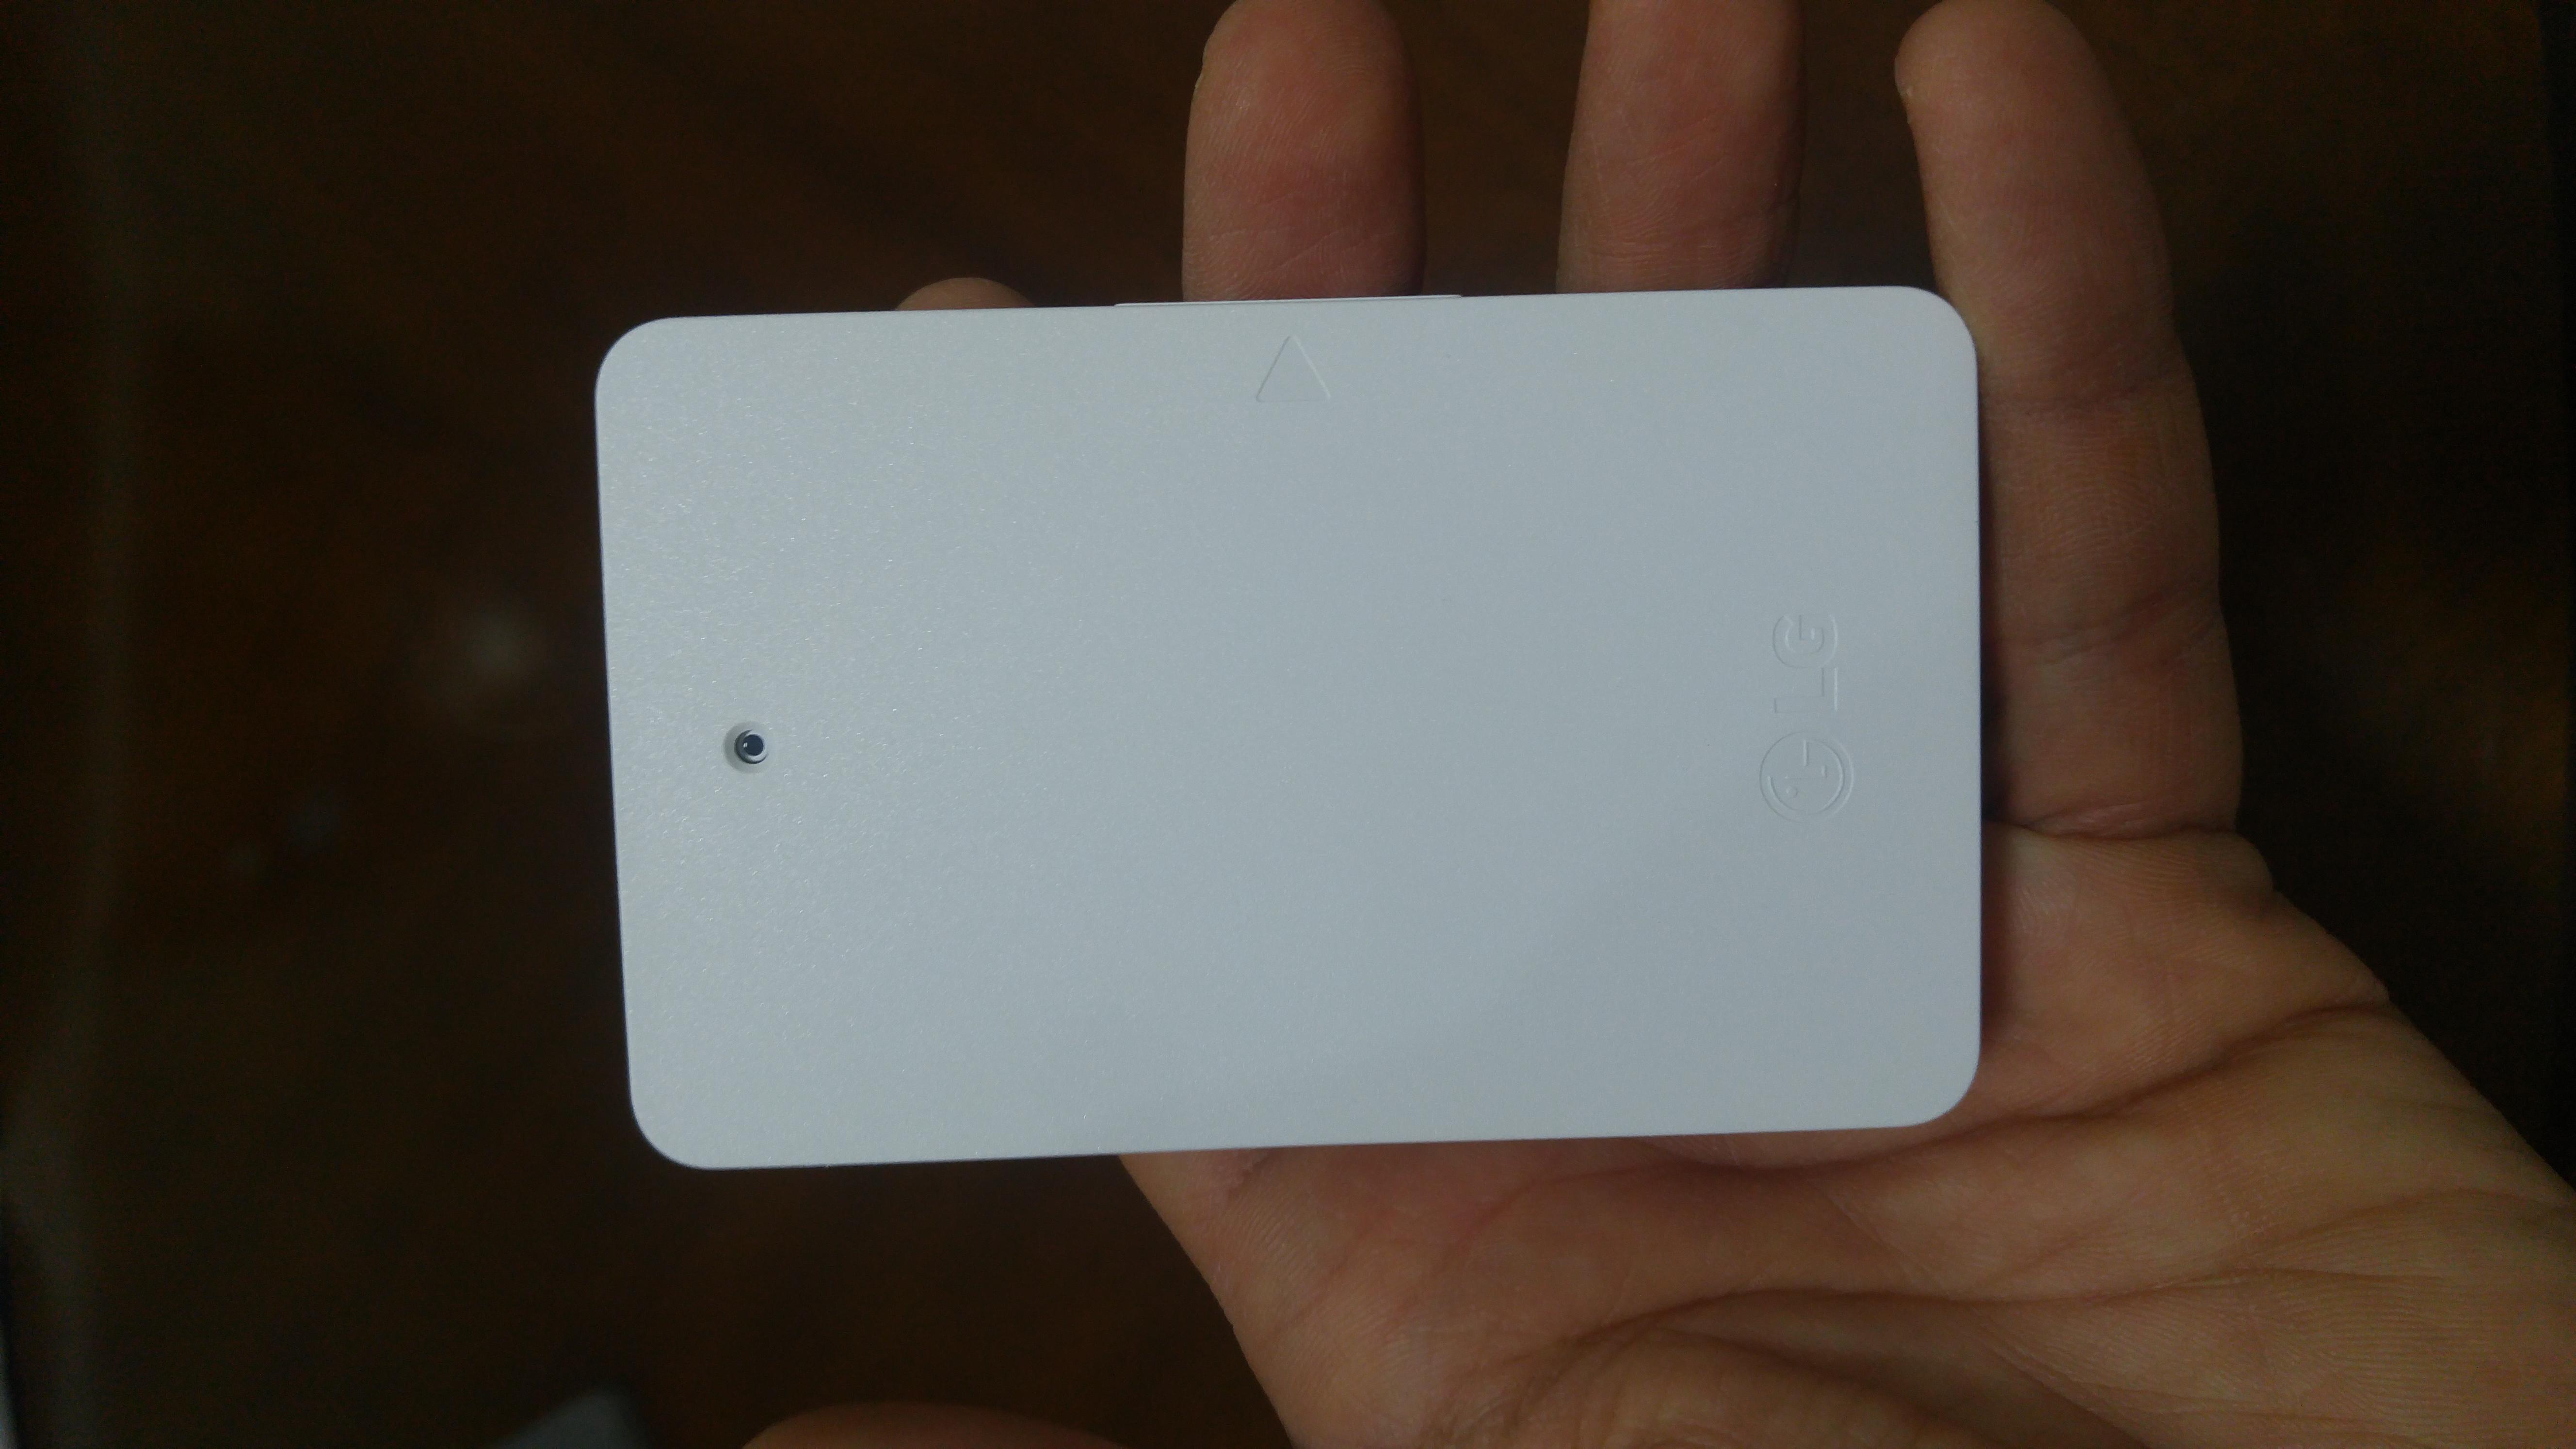 LG G4 charging kit